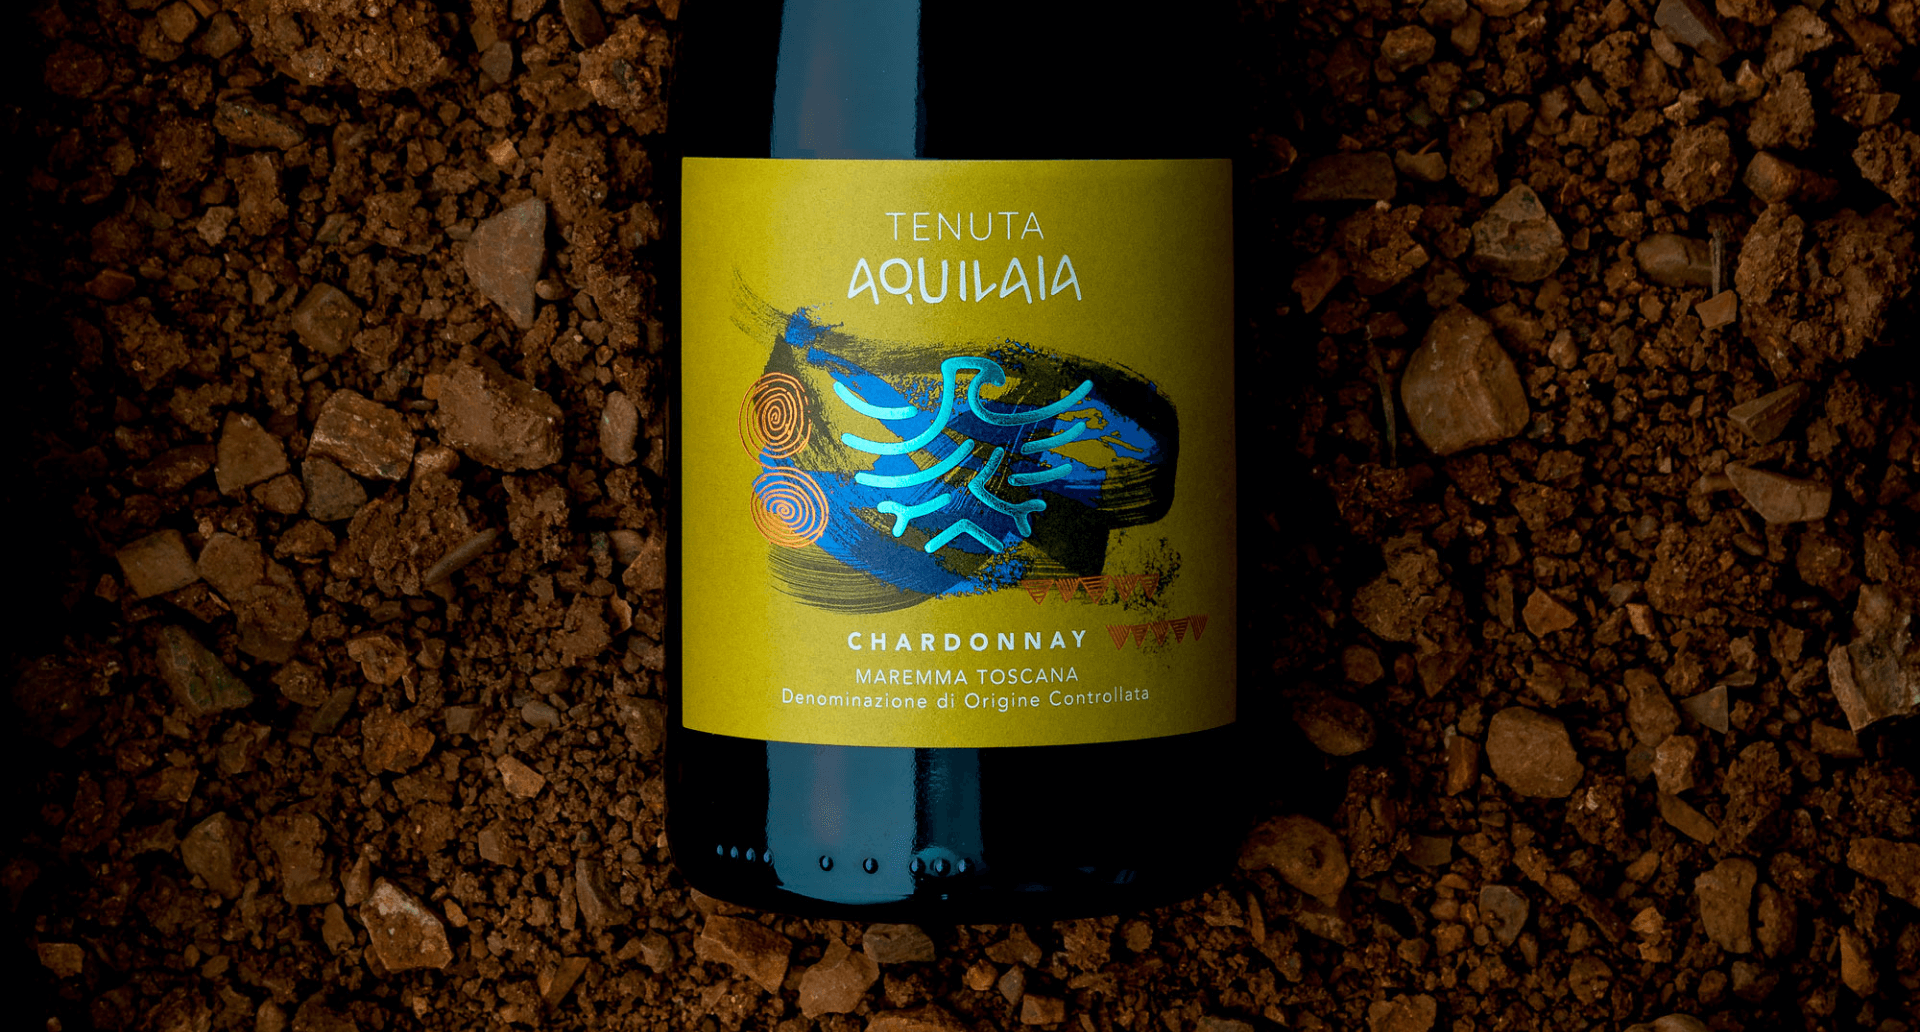 aquilaia-auspici-vino-chardonnay-maremma-toscana